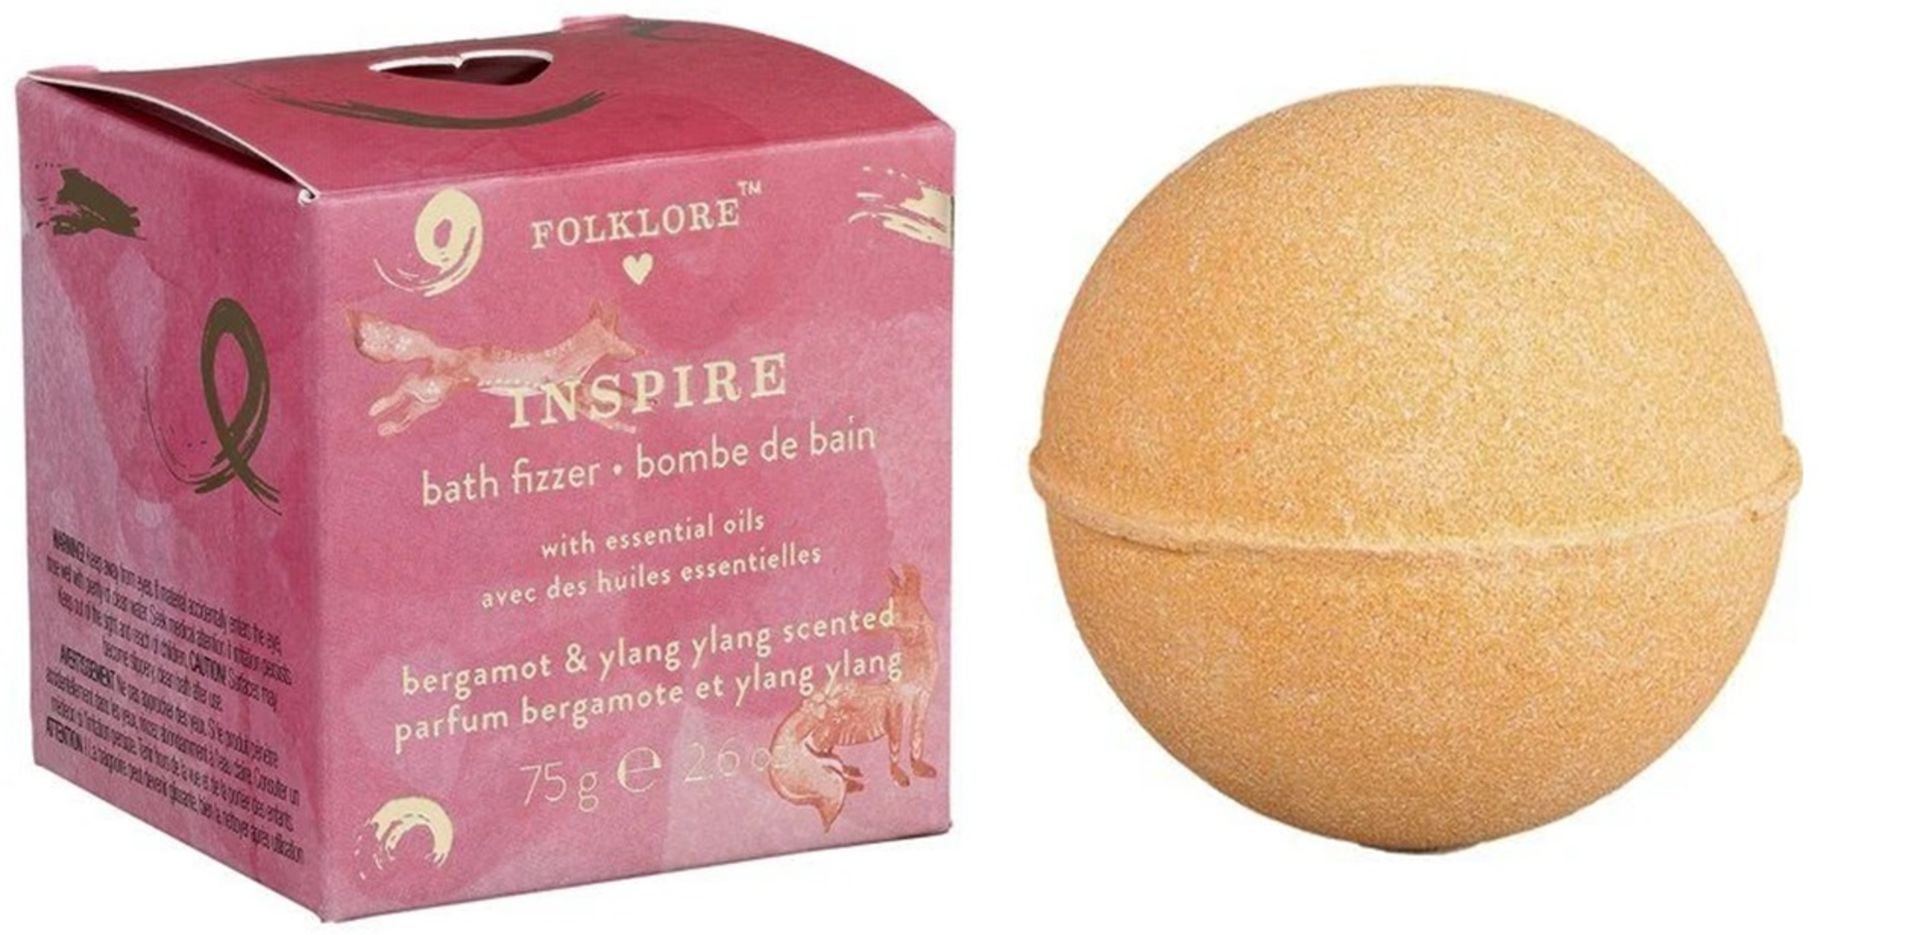 200 x Folklore Bath Bombs   Inspire